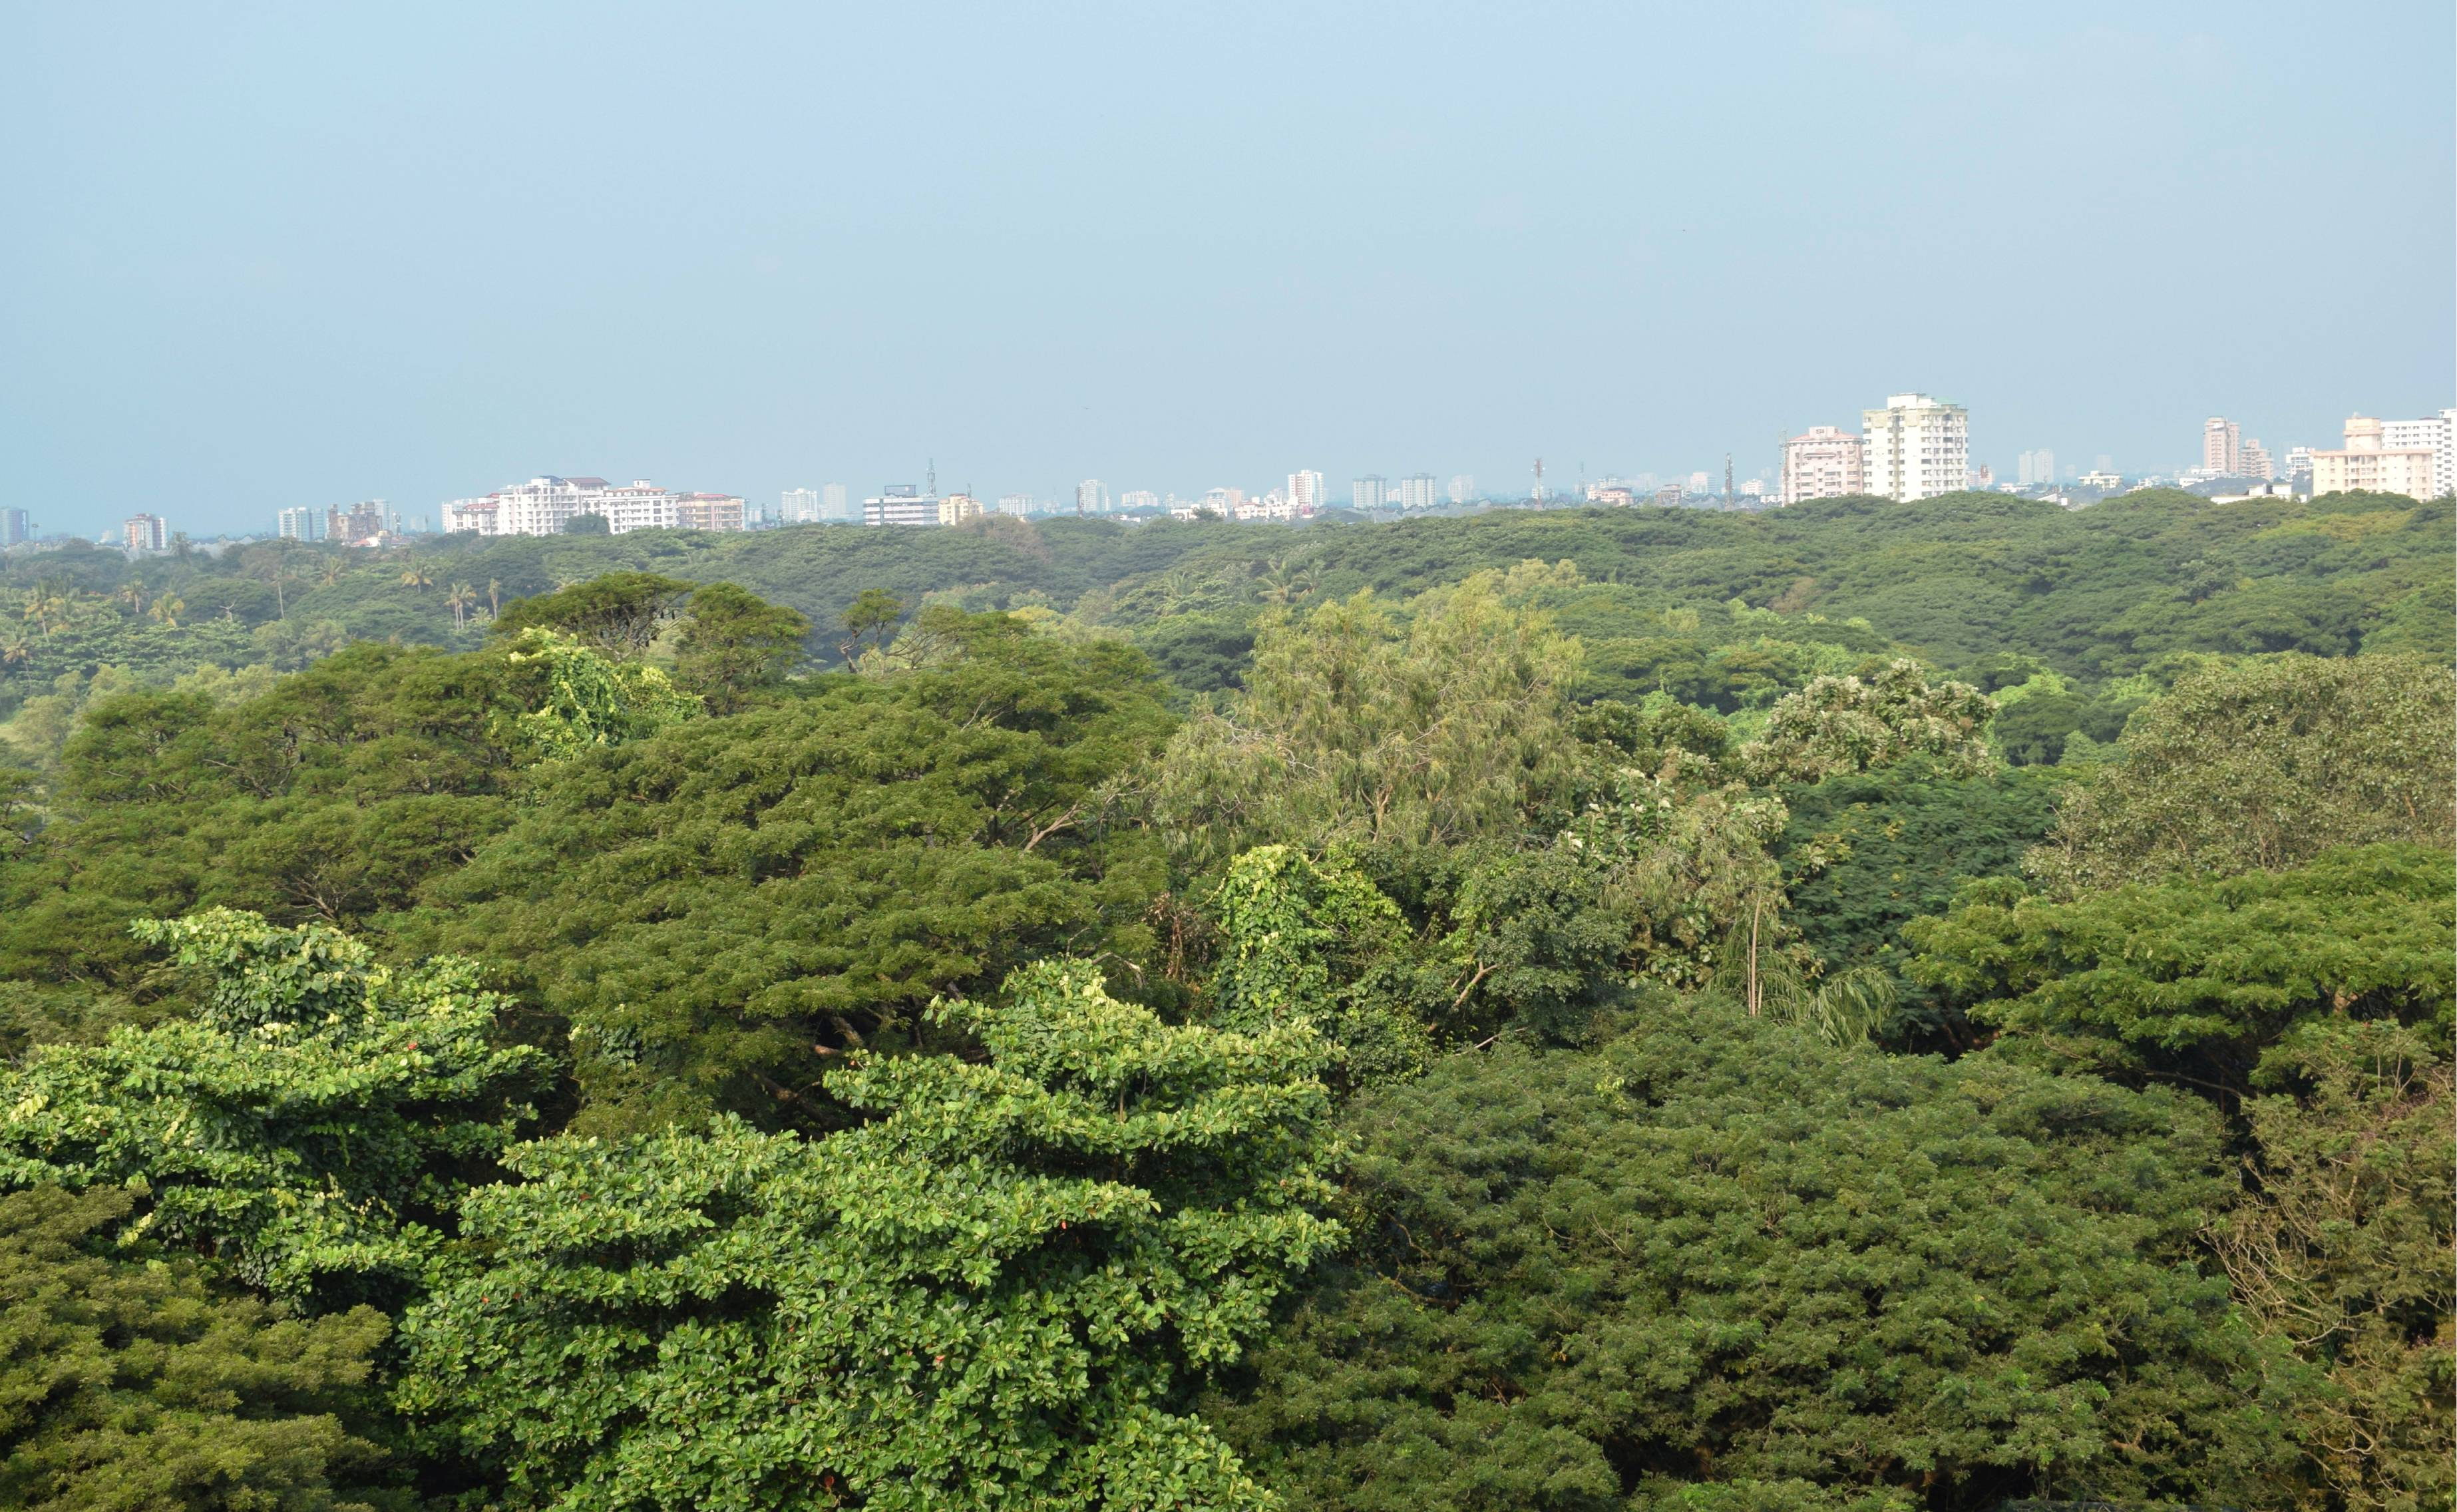 A view of city from Mangalavanam Bird Sanctuary